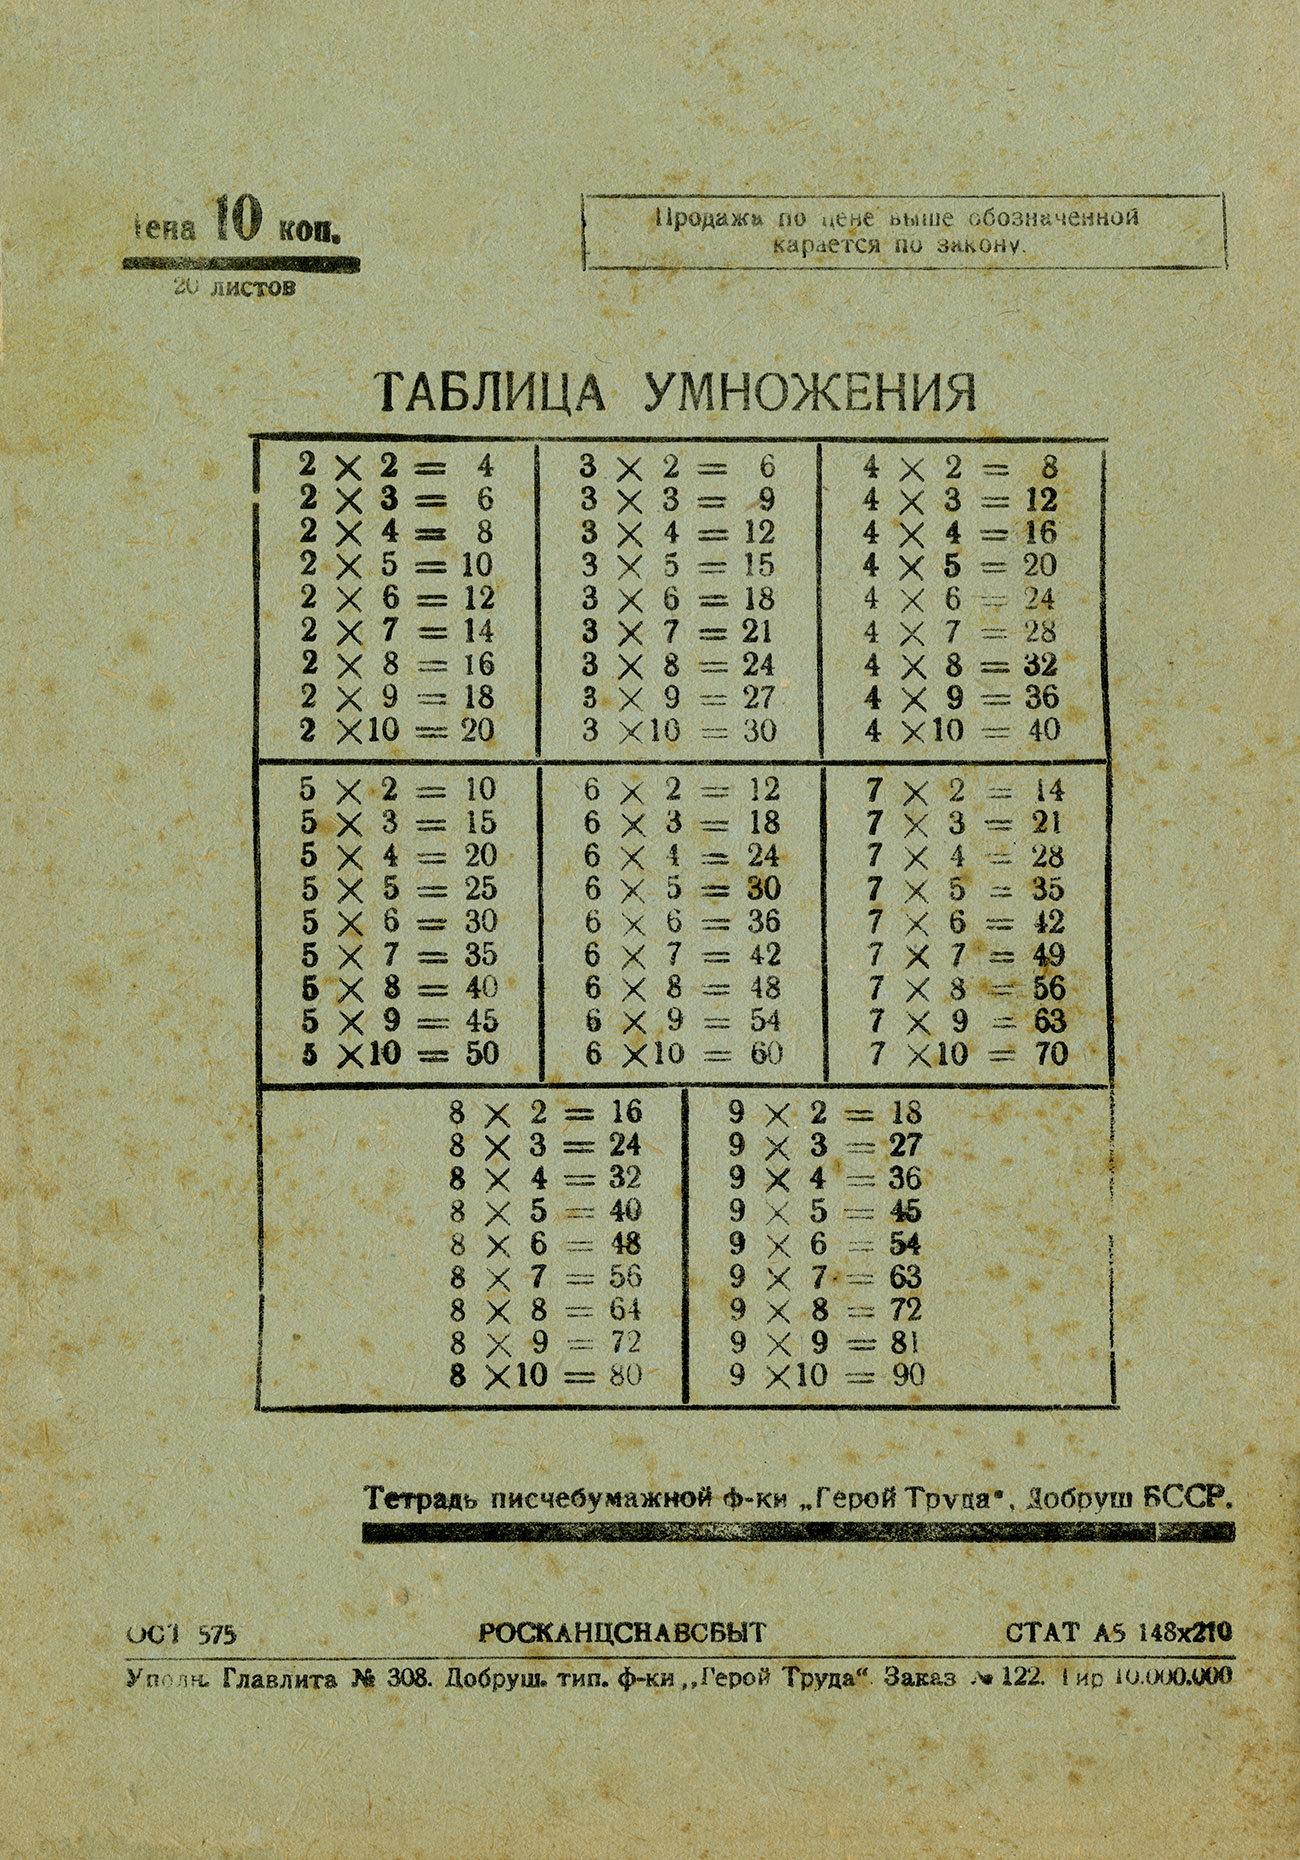 Ленин, 20 листов, 148х210, оборот